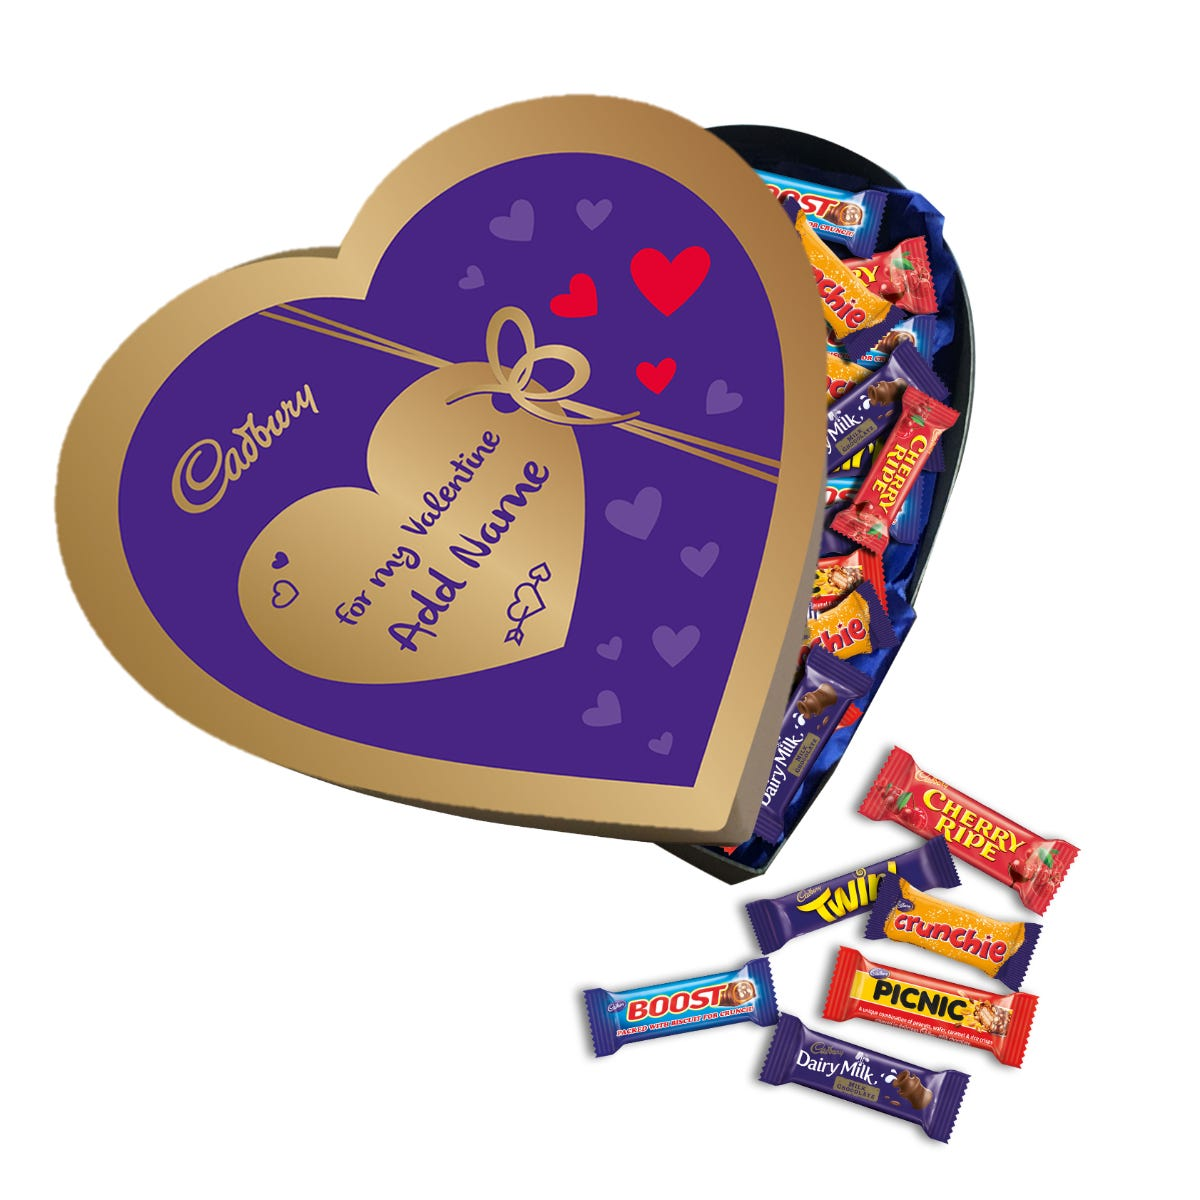 Cadbury Heart Shaped Giftbox - Make your own